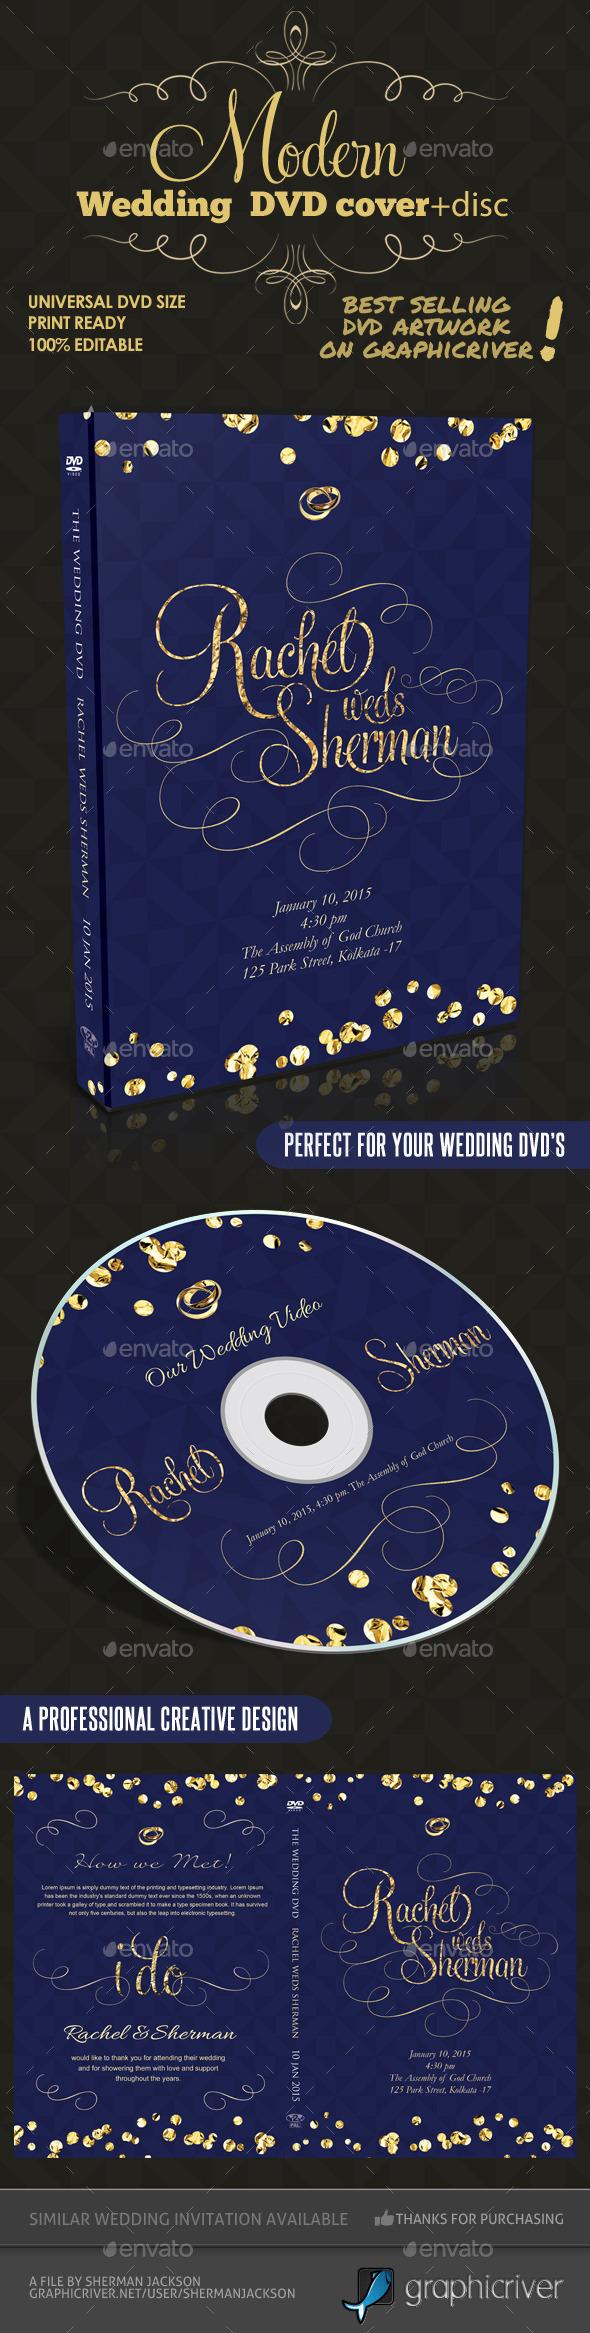 Modern Wedding DVD Cover & Disc Template - CD & DVD Artwork Print Templates